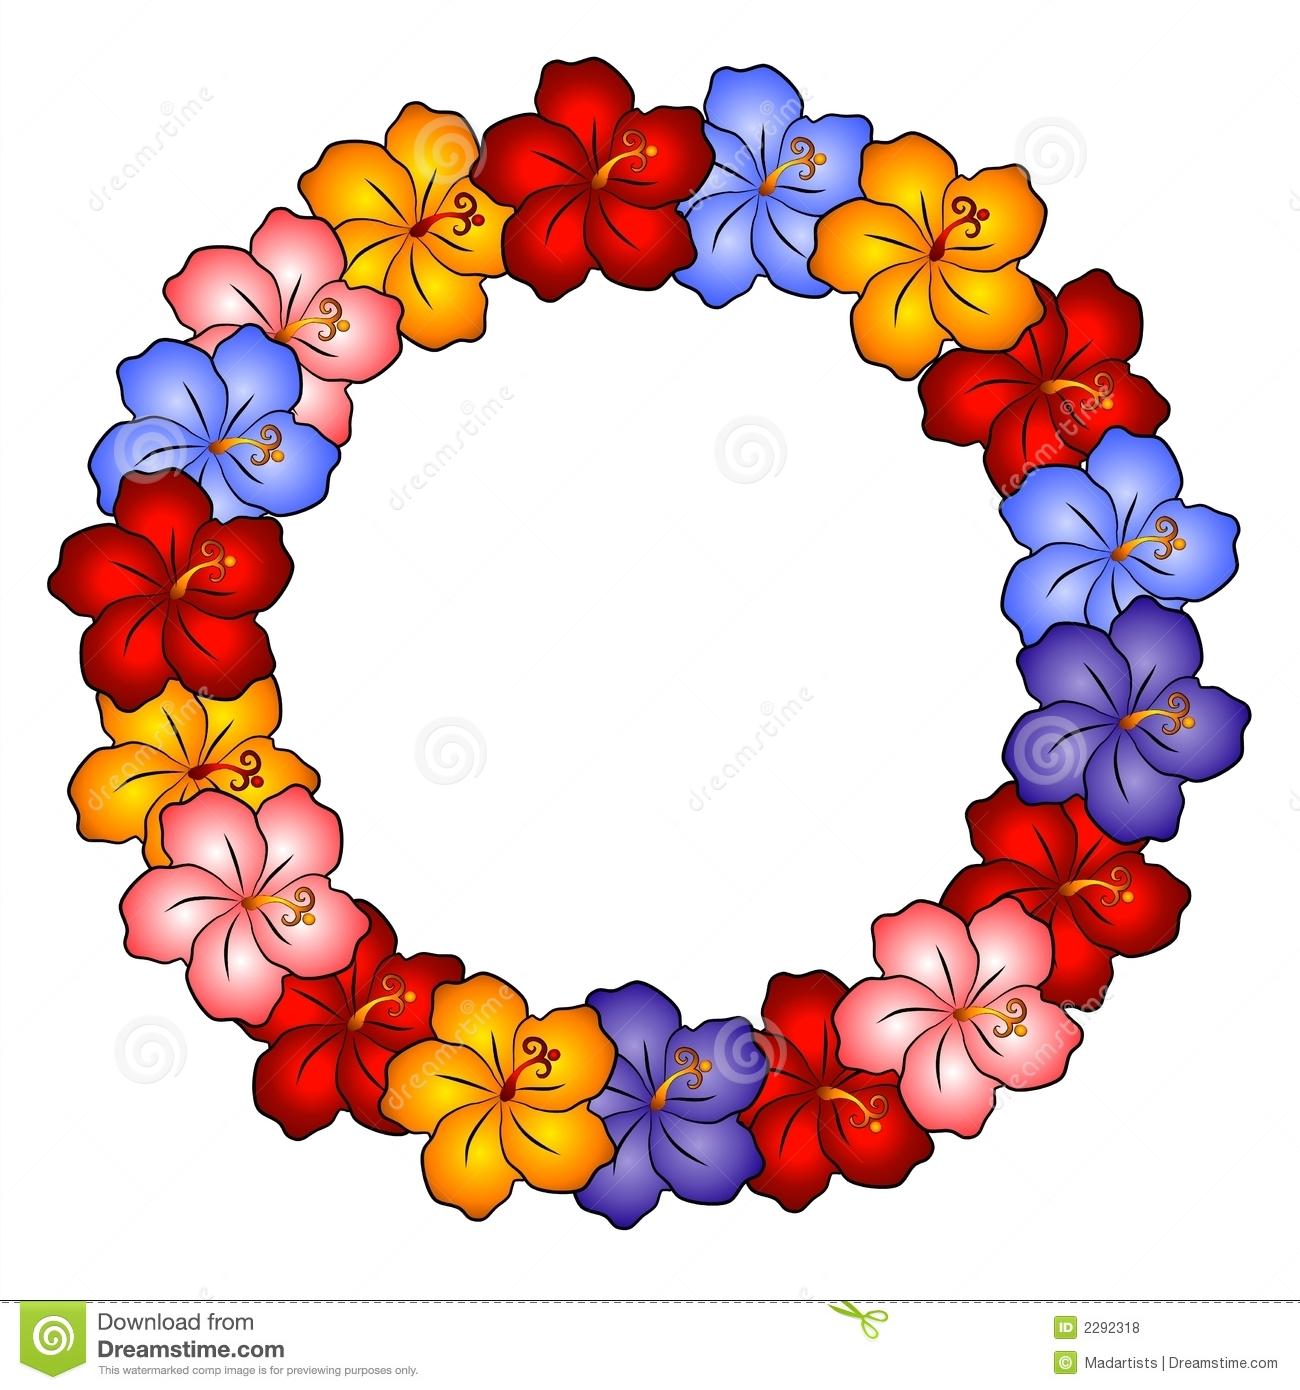 Hawaiian flower clipart free download best hawaiian flower clipart 1300x1390 hawaiian lei clipart izmirmasajfo